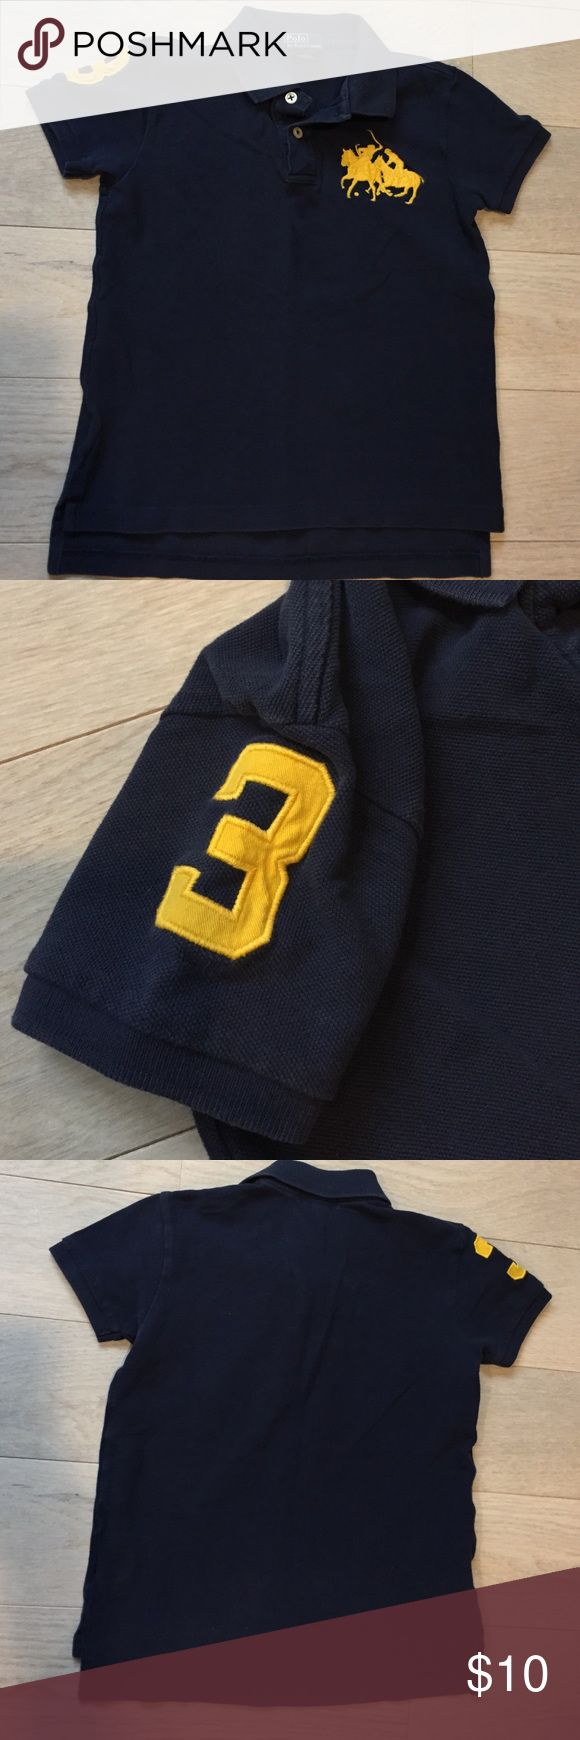 Polo by Ralph Lauren navy blue polo shirt.  Sz 6. Polo by Ralph Lauren navy blue polo shirt.  Sz 6. Polo by Ralph Lauren Shirts & Tops Polos